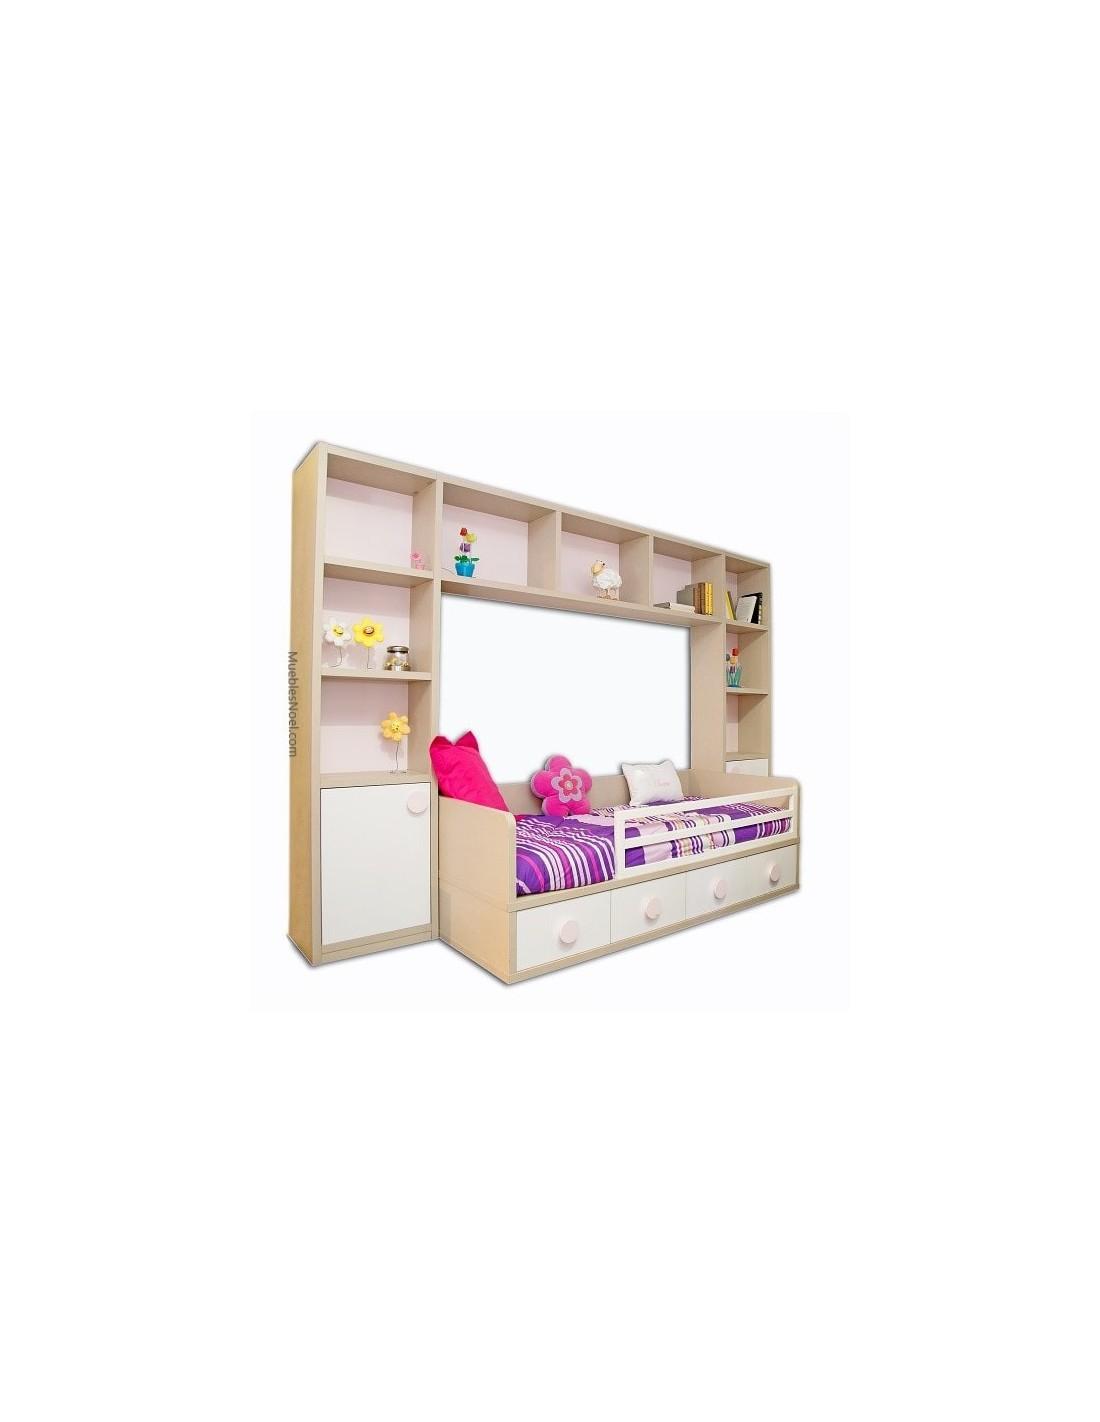 Dormitorio juvenil con librerias